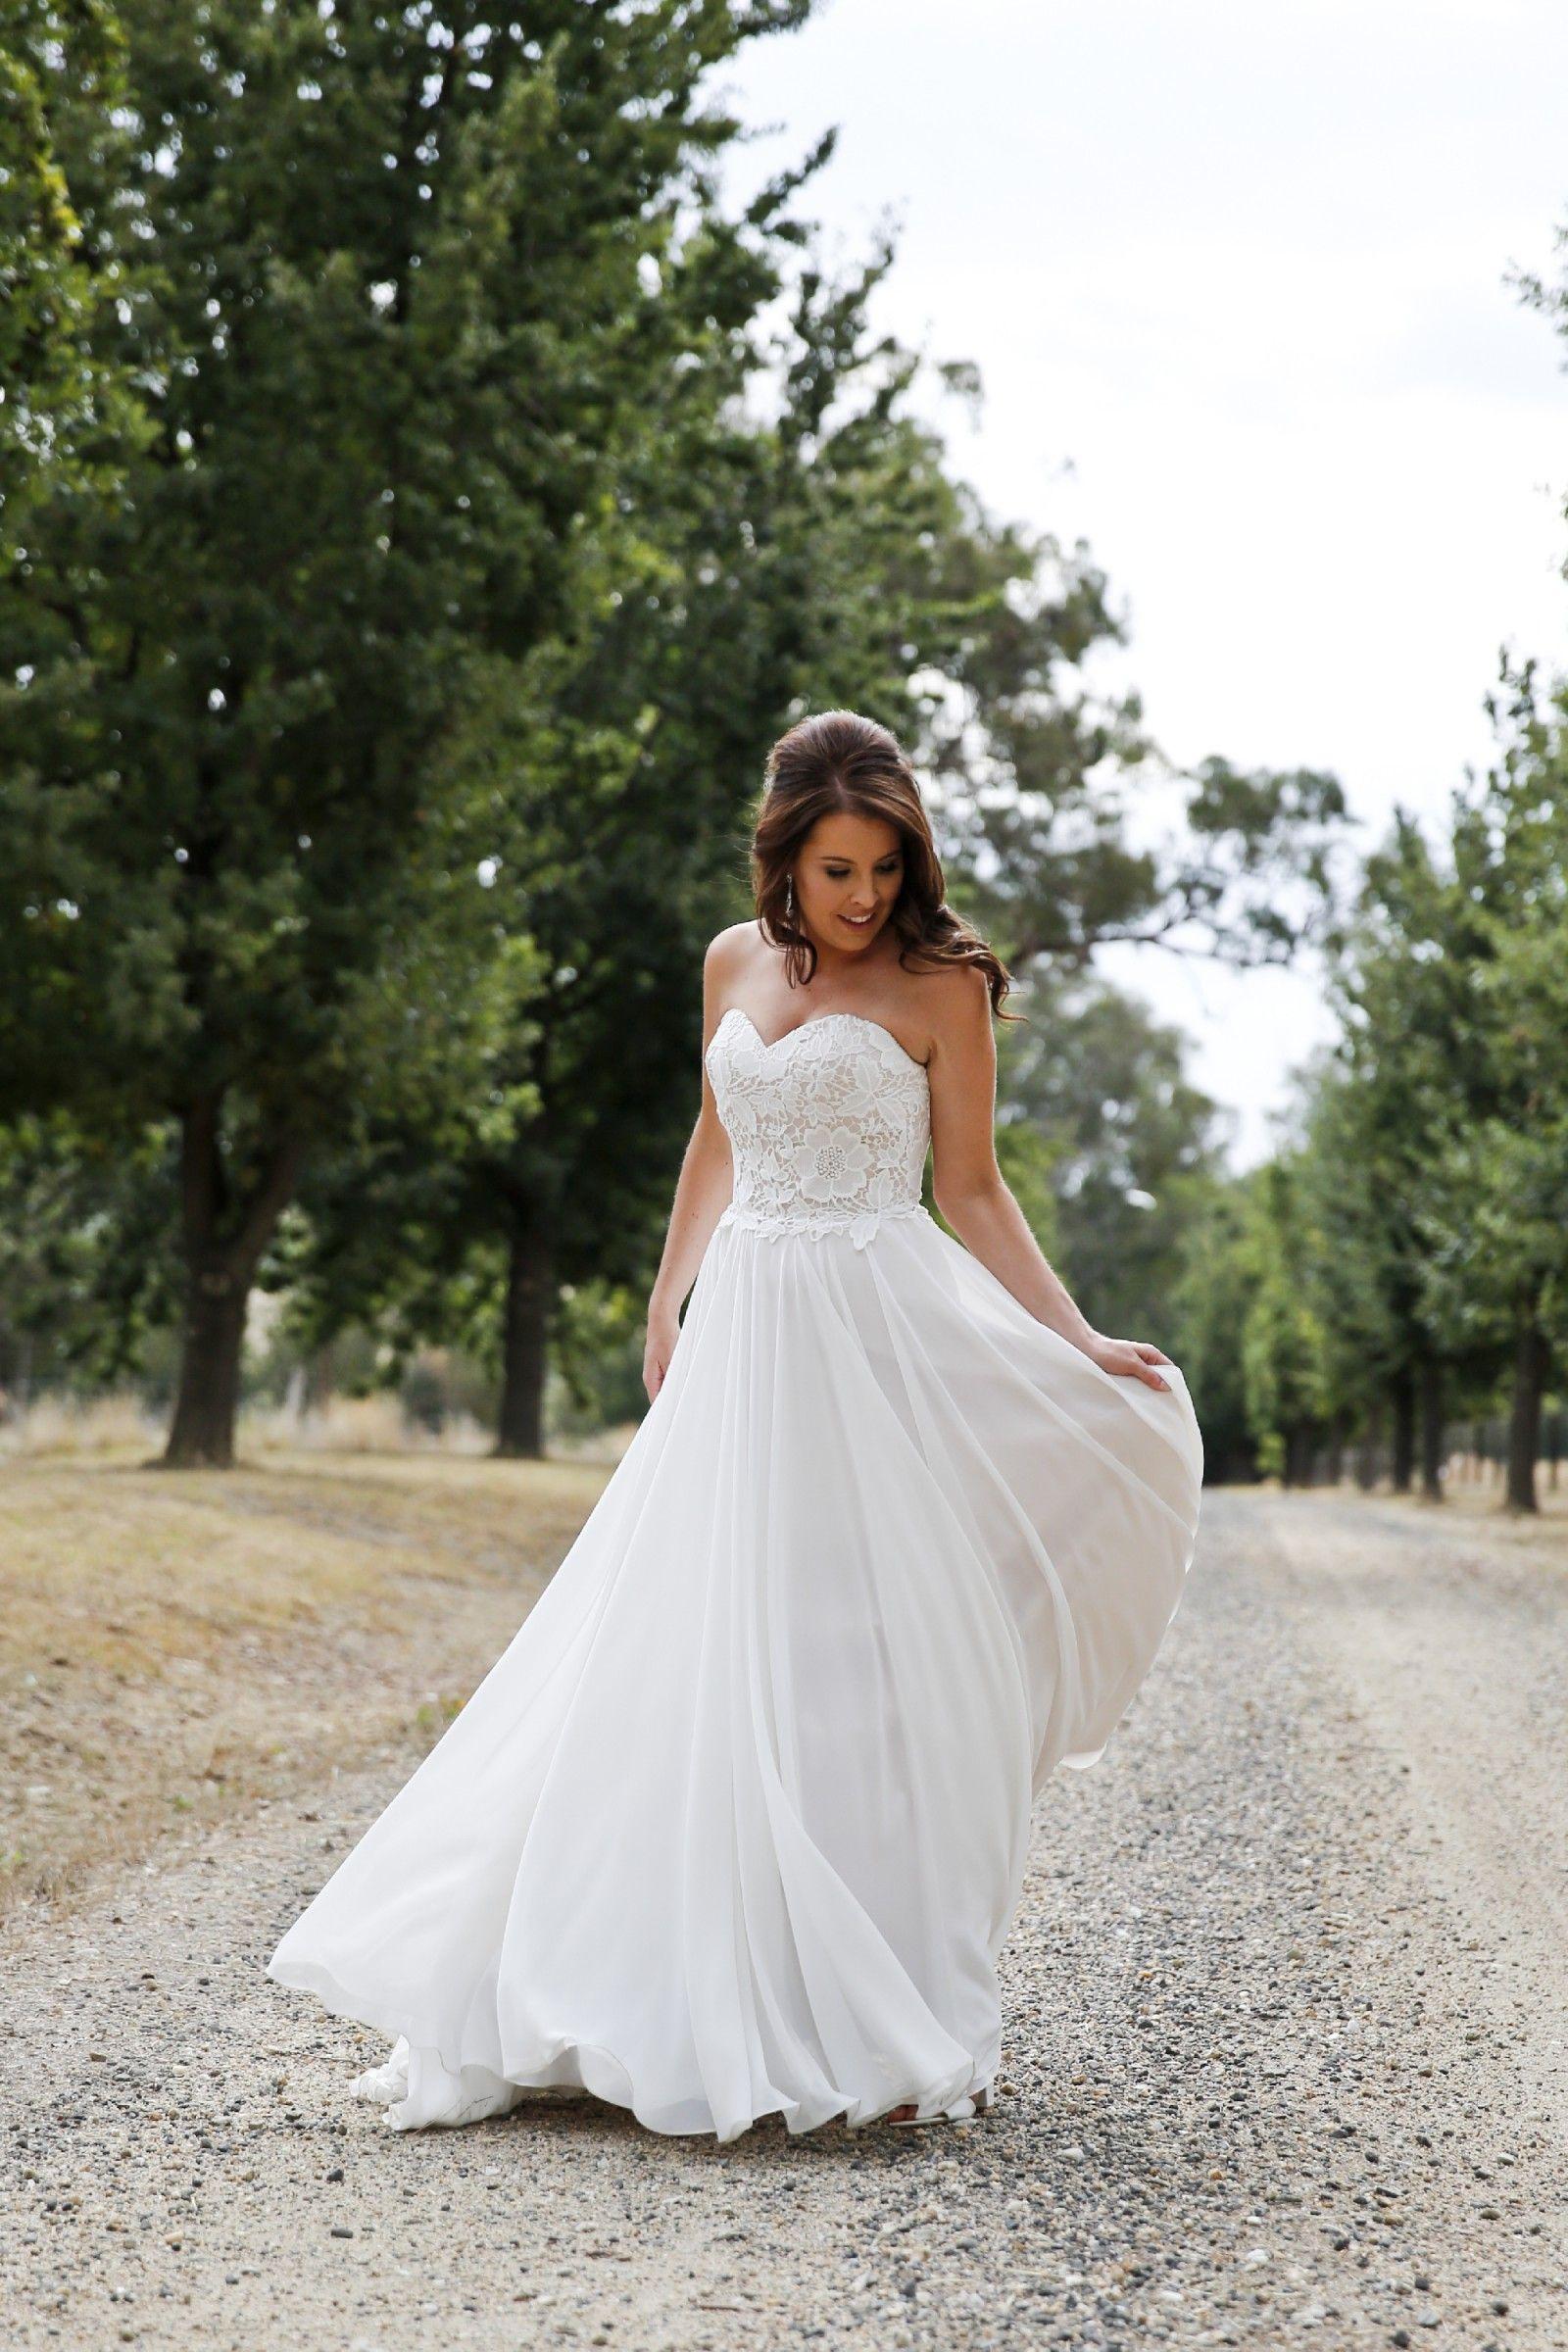 Previously owned wedding dresses  Wendy Sullivan Estelle Size  Wedding Dress  Slim waist Wedding